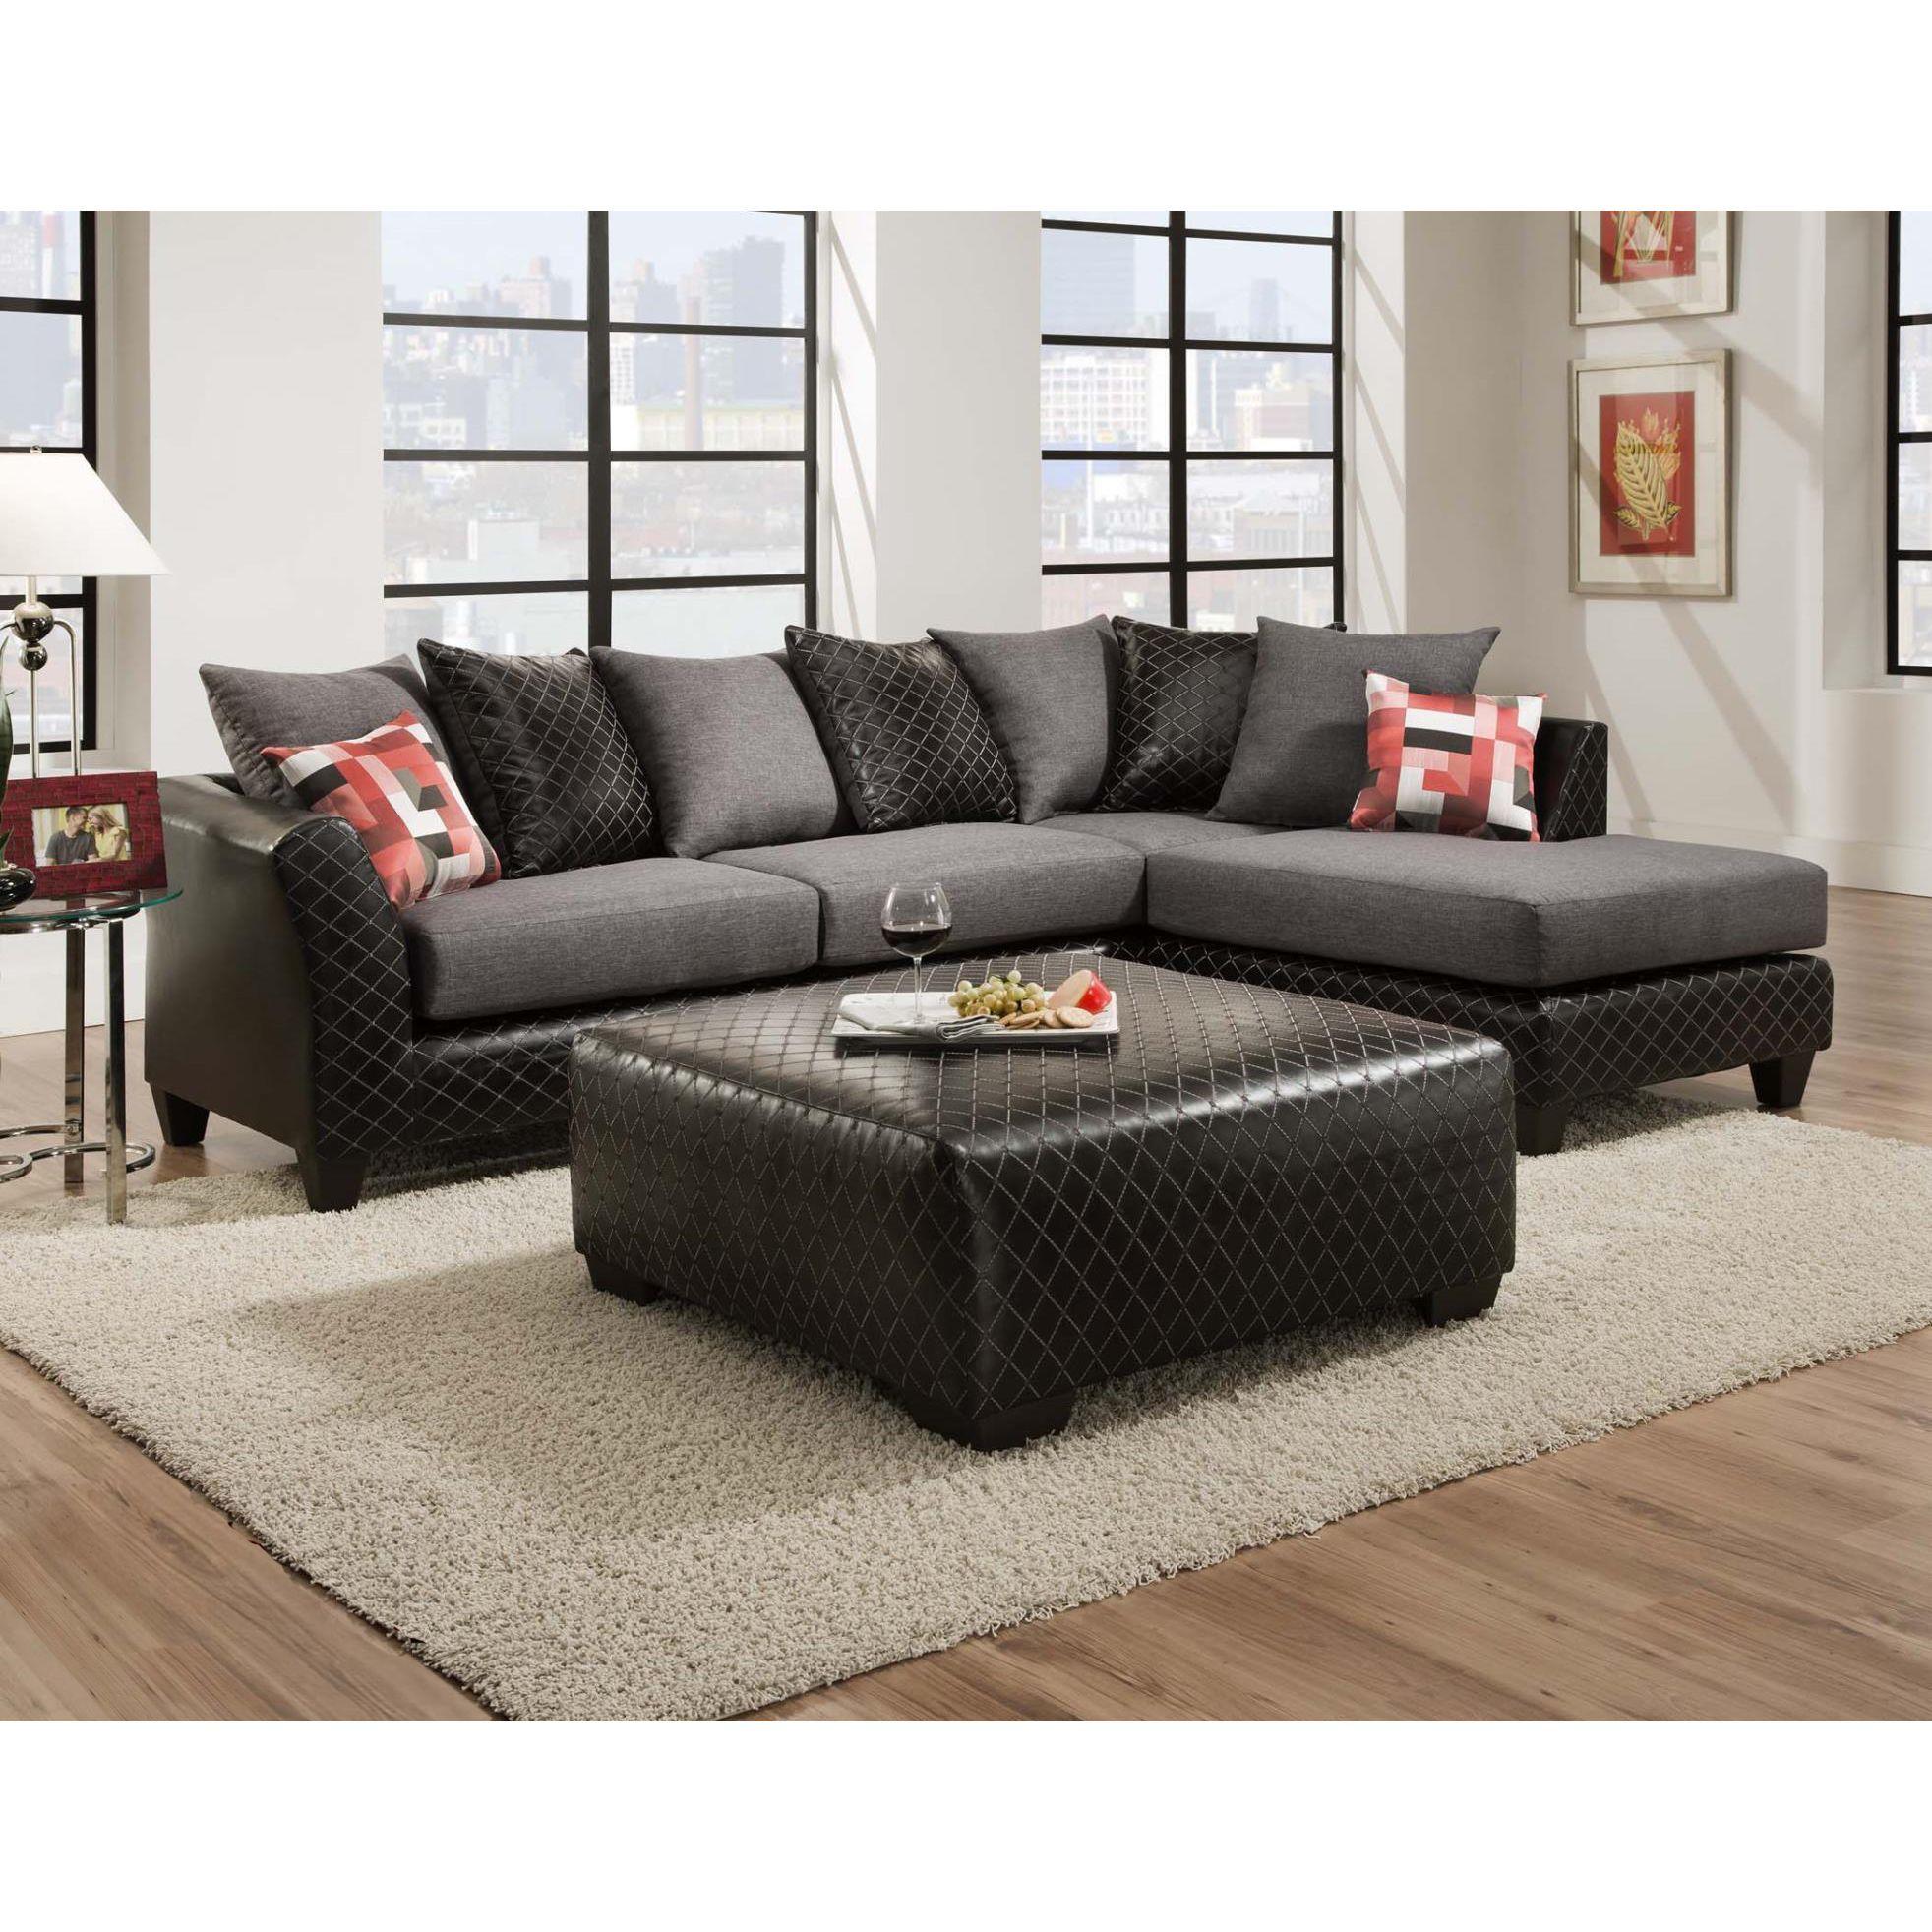 Sofa Trendz Dalin Black Microfiber Sectional Sofa (Dalin ...